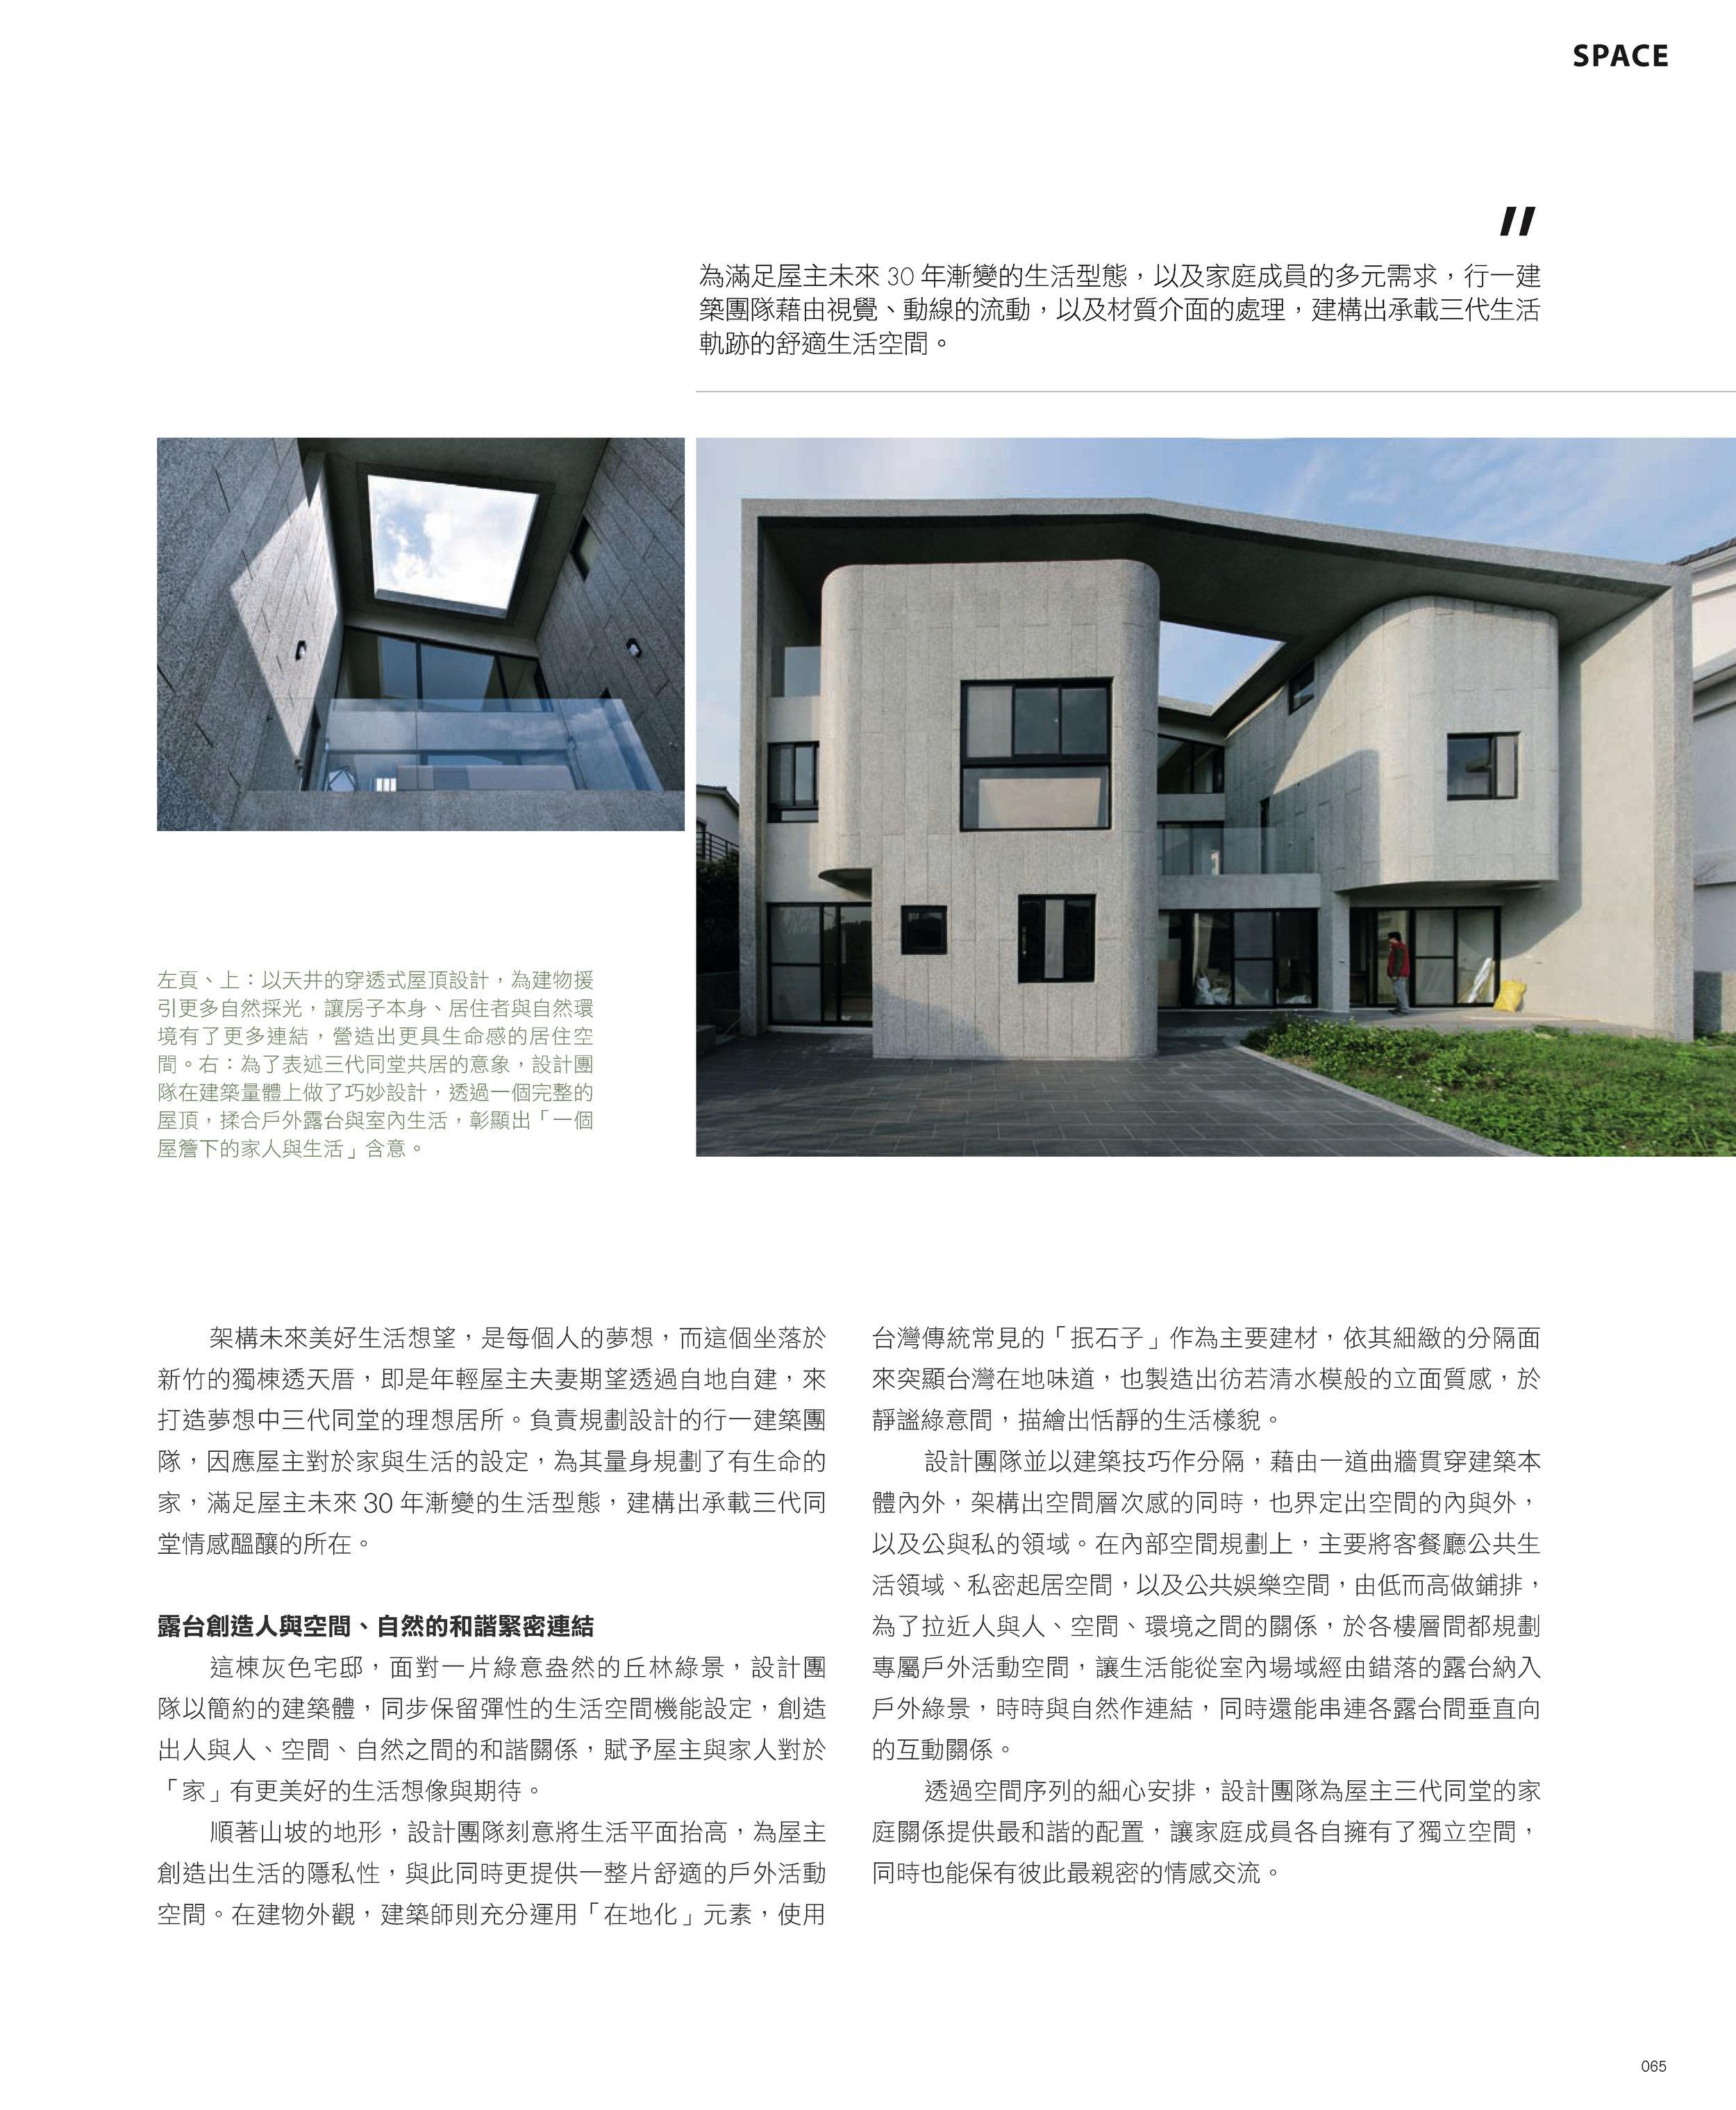 myhome201_SPACE_行一建築彭文苑建築師事務所_以空間動線、材質與自然做連結 揉合三代生活軌跡的光合之家_頁面_5.jpg